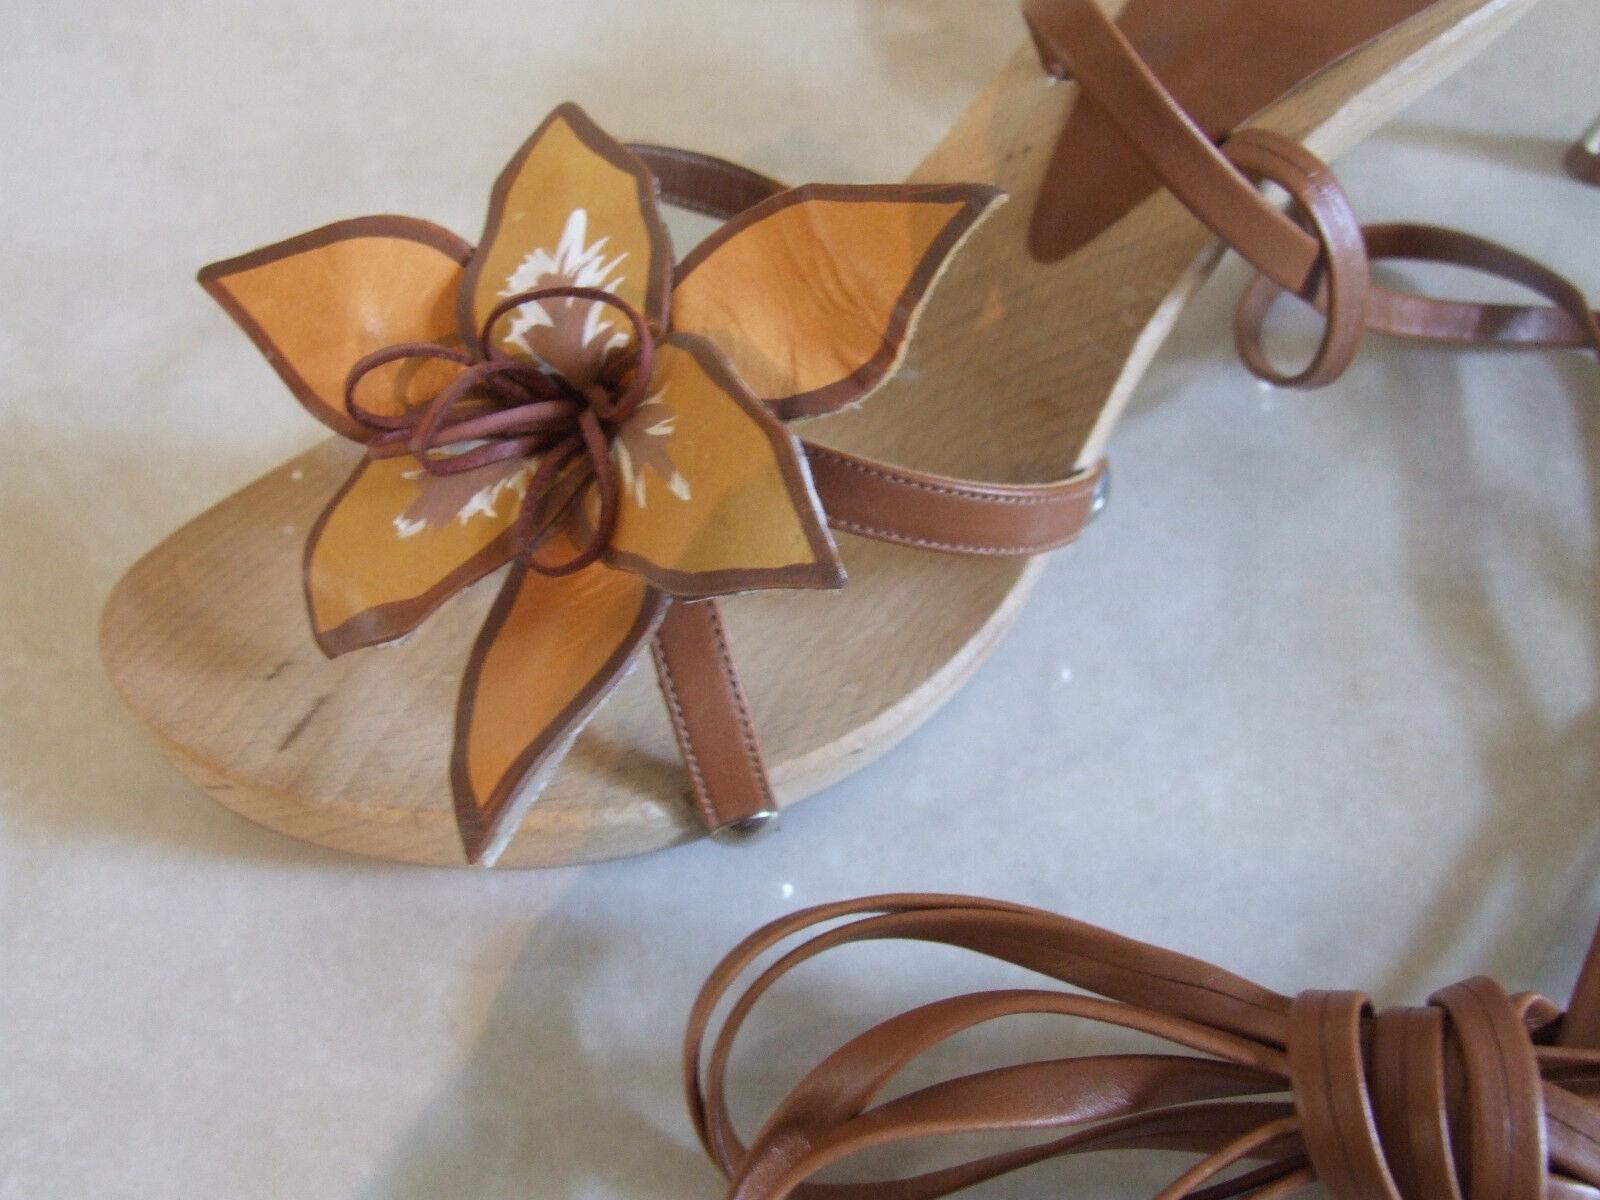 Stunning Enchanting Leder Flower Lace Up Gold Kitten Heel Enchanting Stunning Wooden Sandales EU 41 6a999e